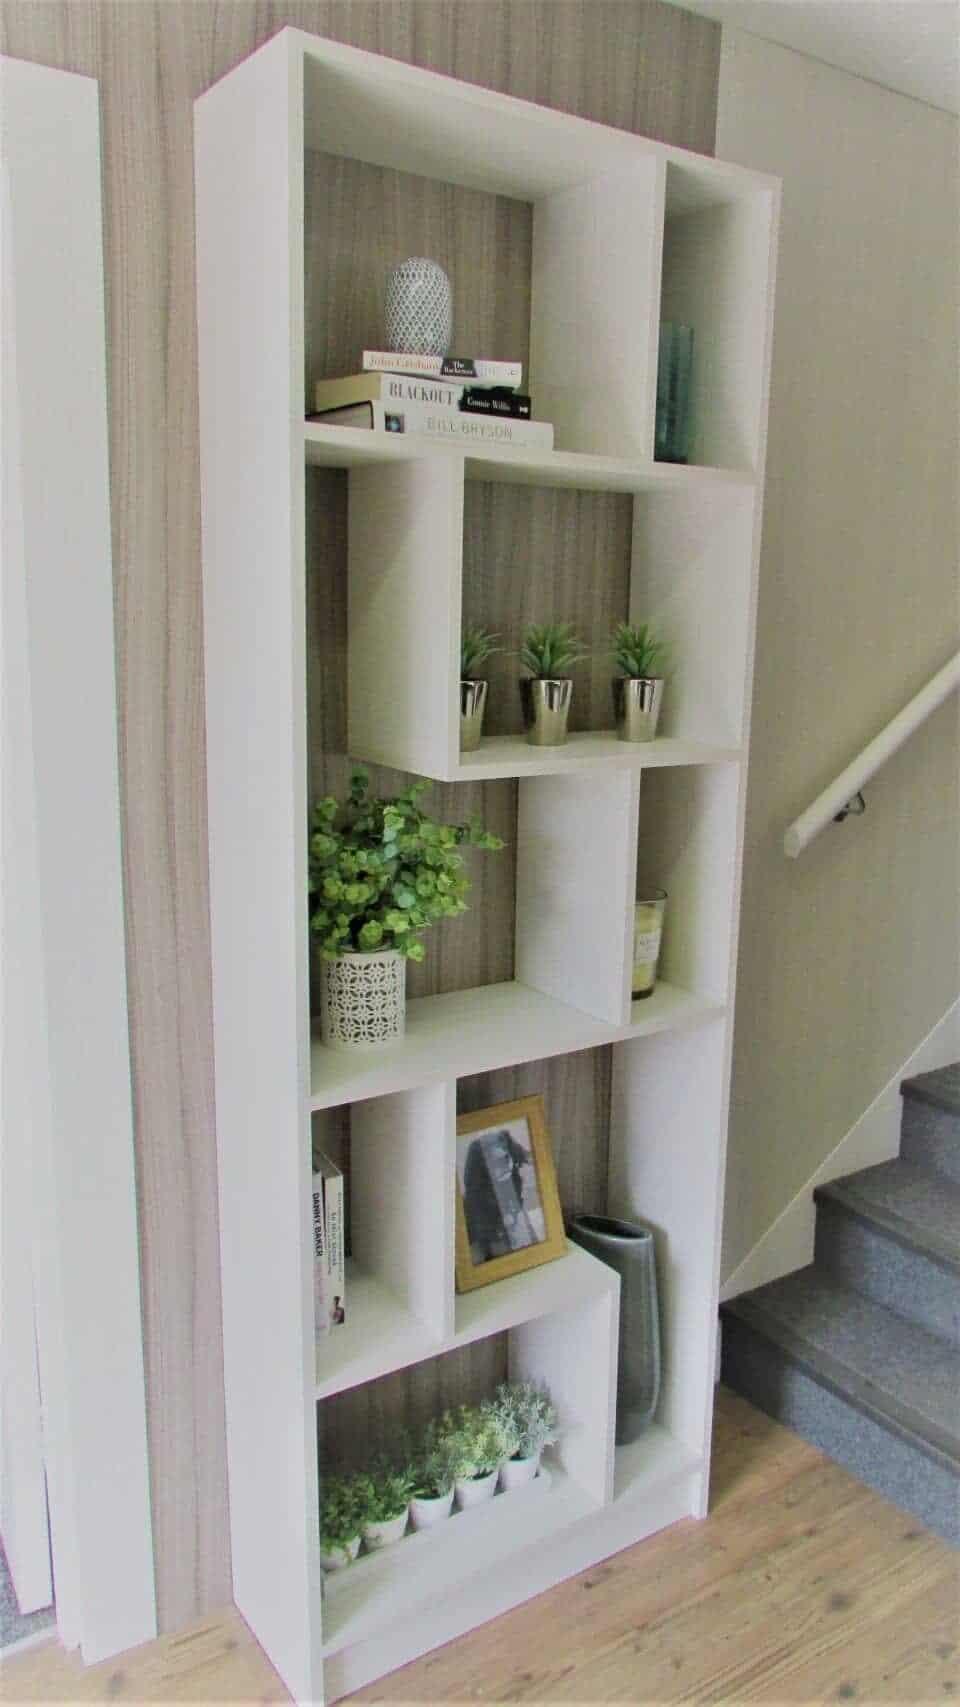 Display unit in textured woodgrain.